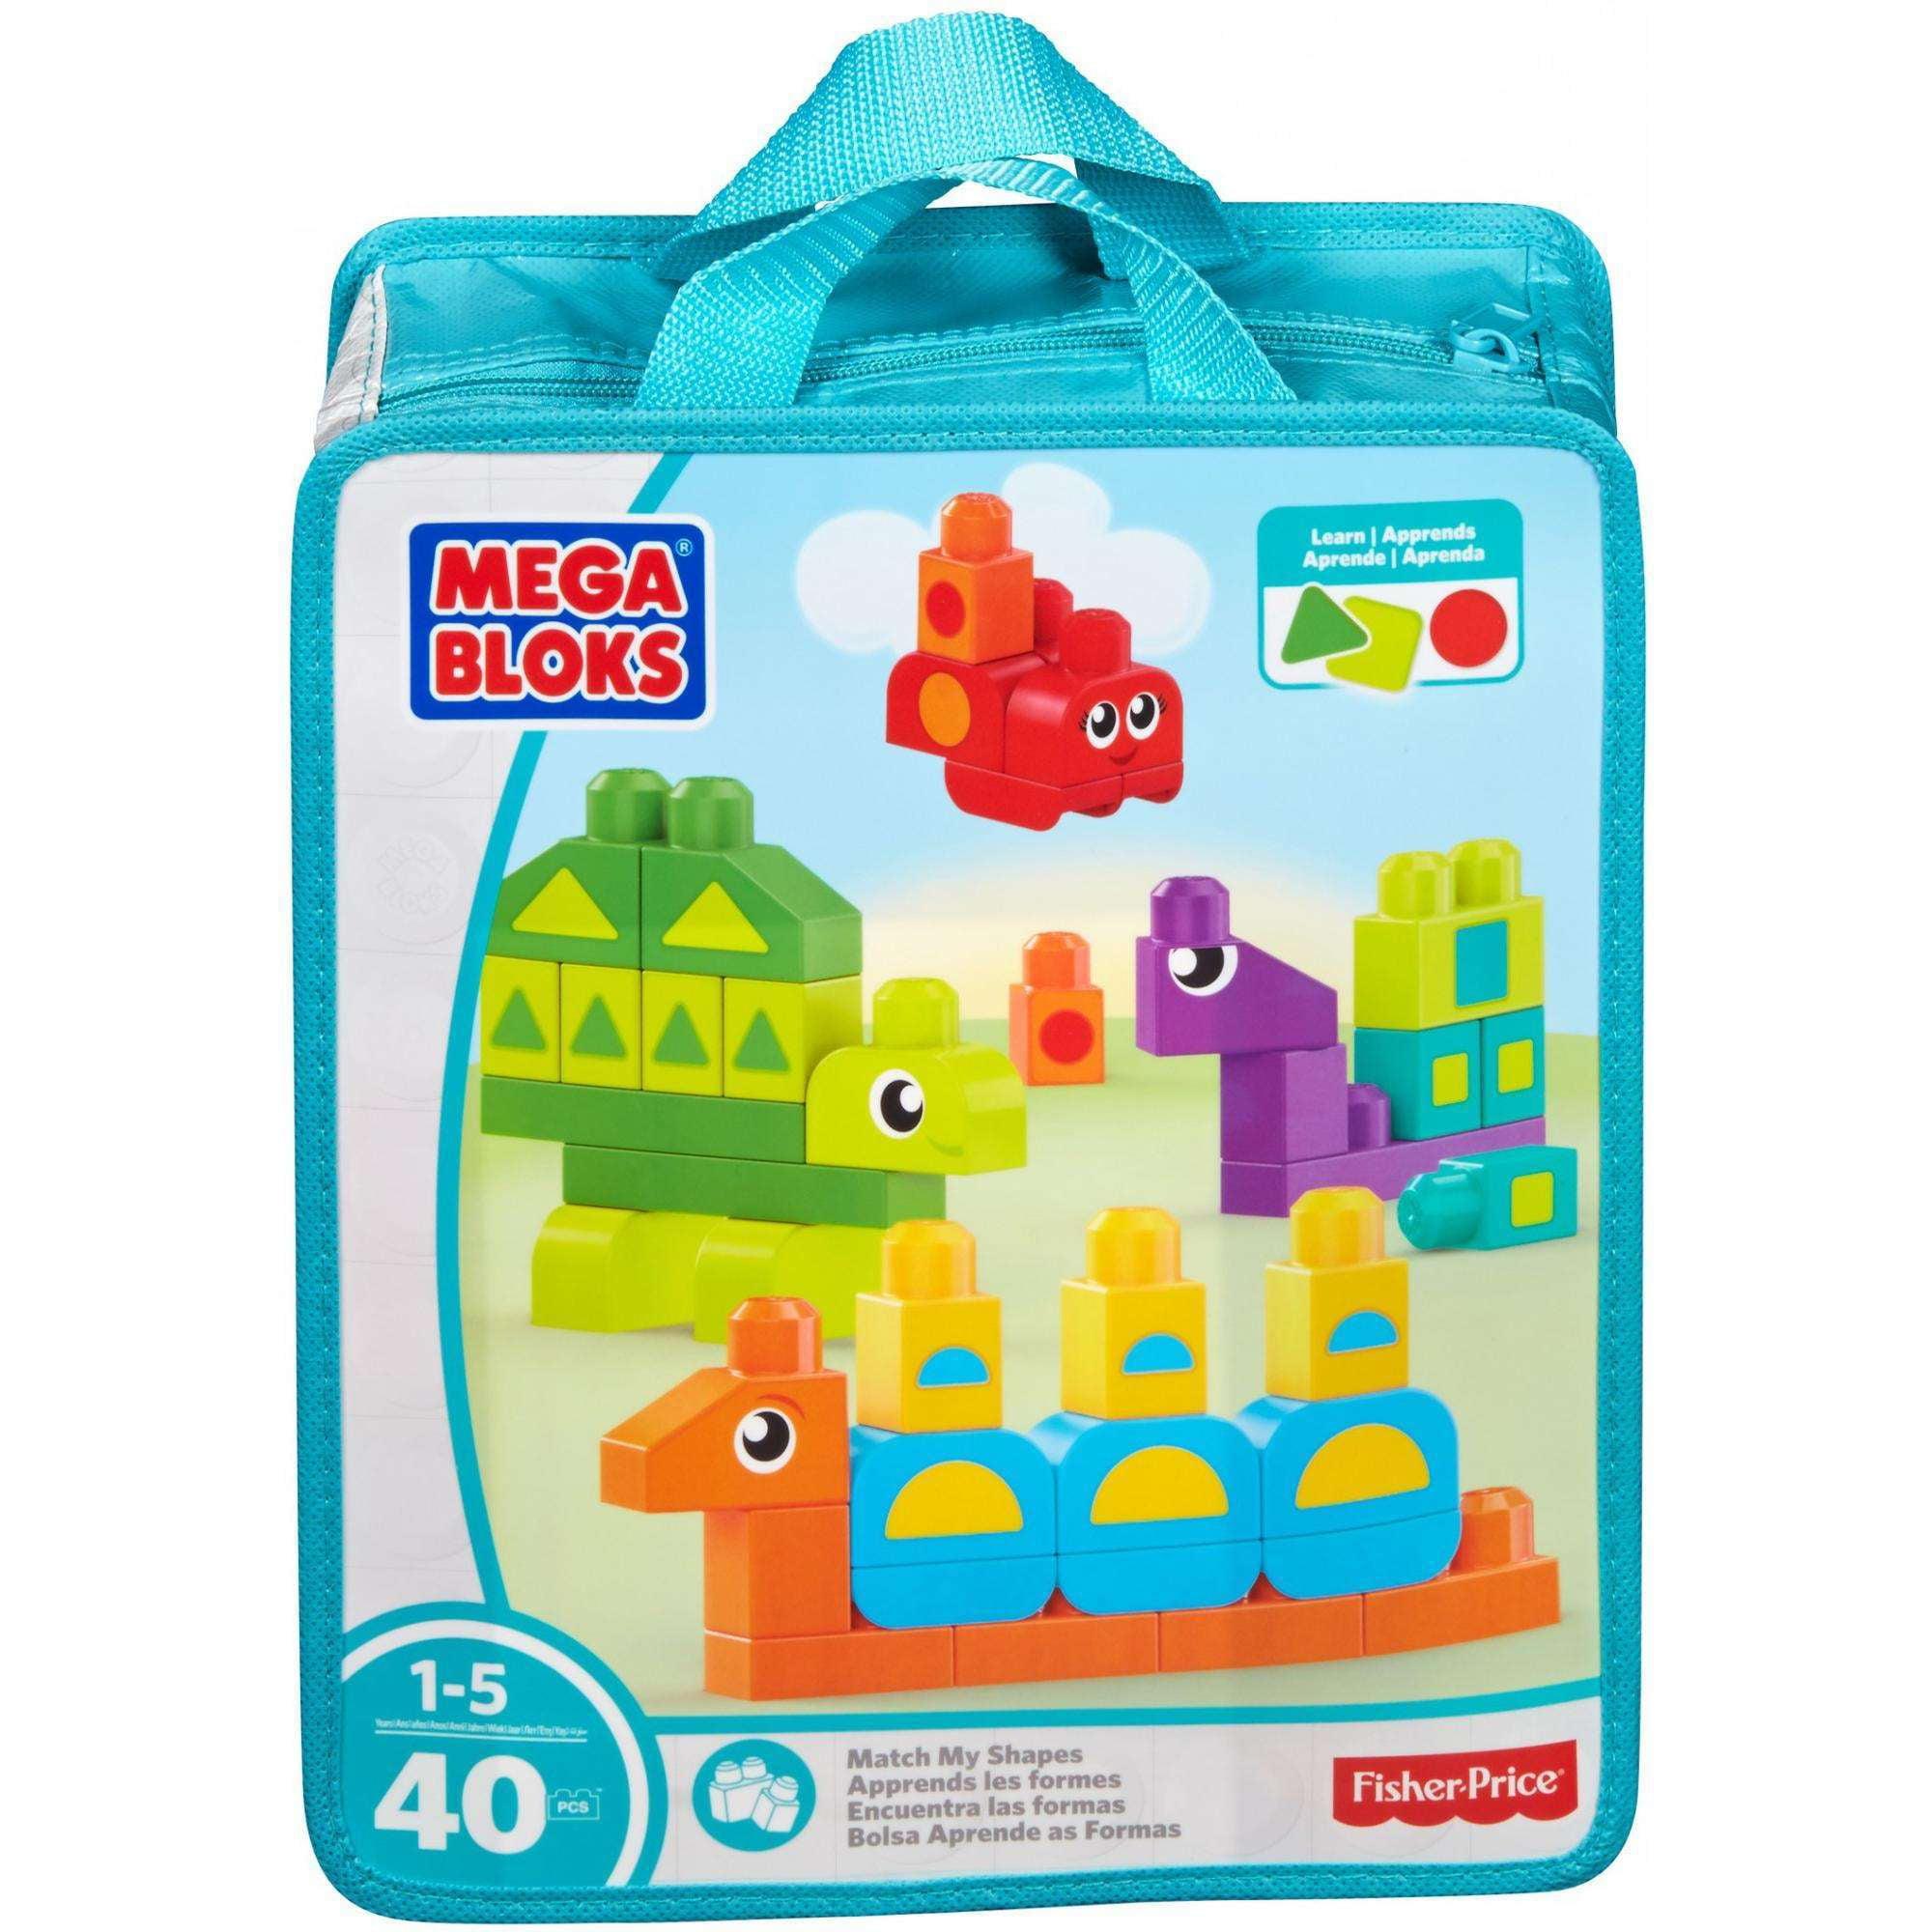 Mega Bloks Learn My Shapes Building Set